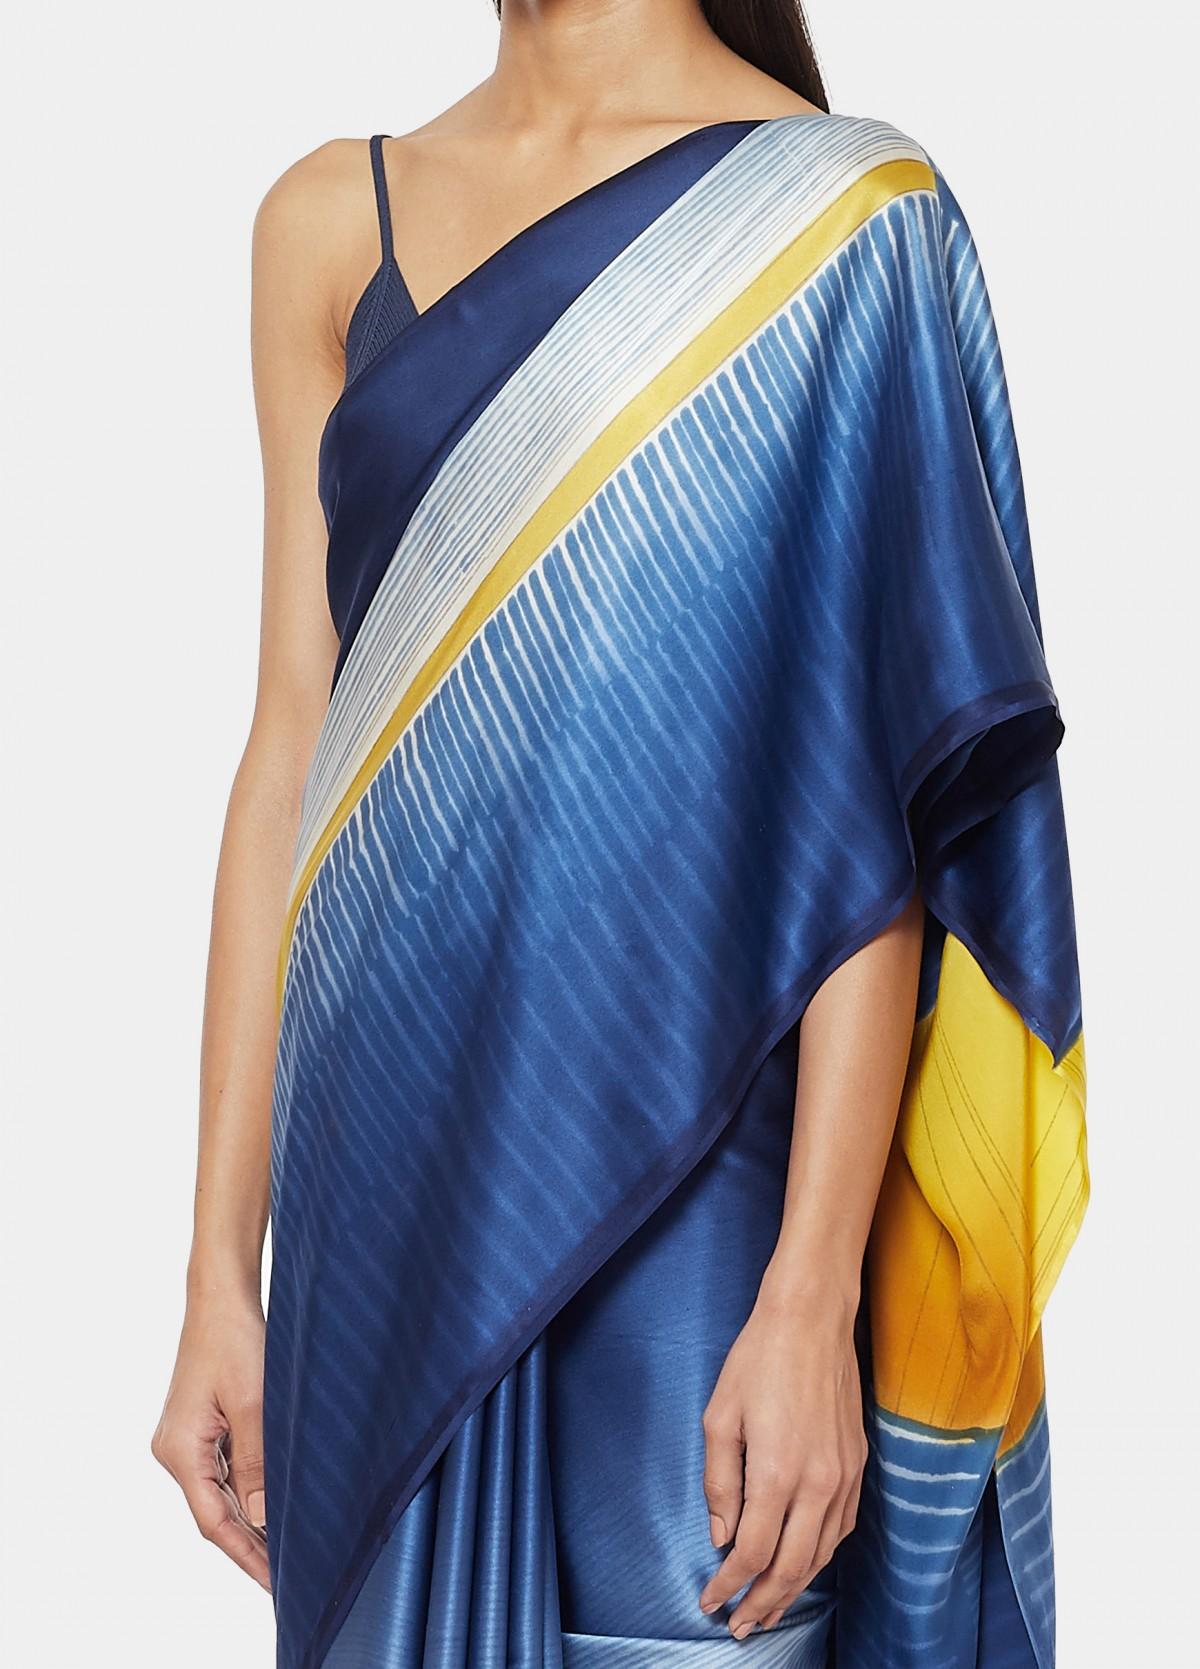 The Nilli Sari